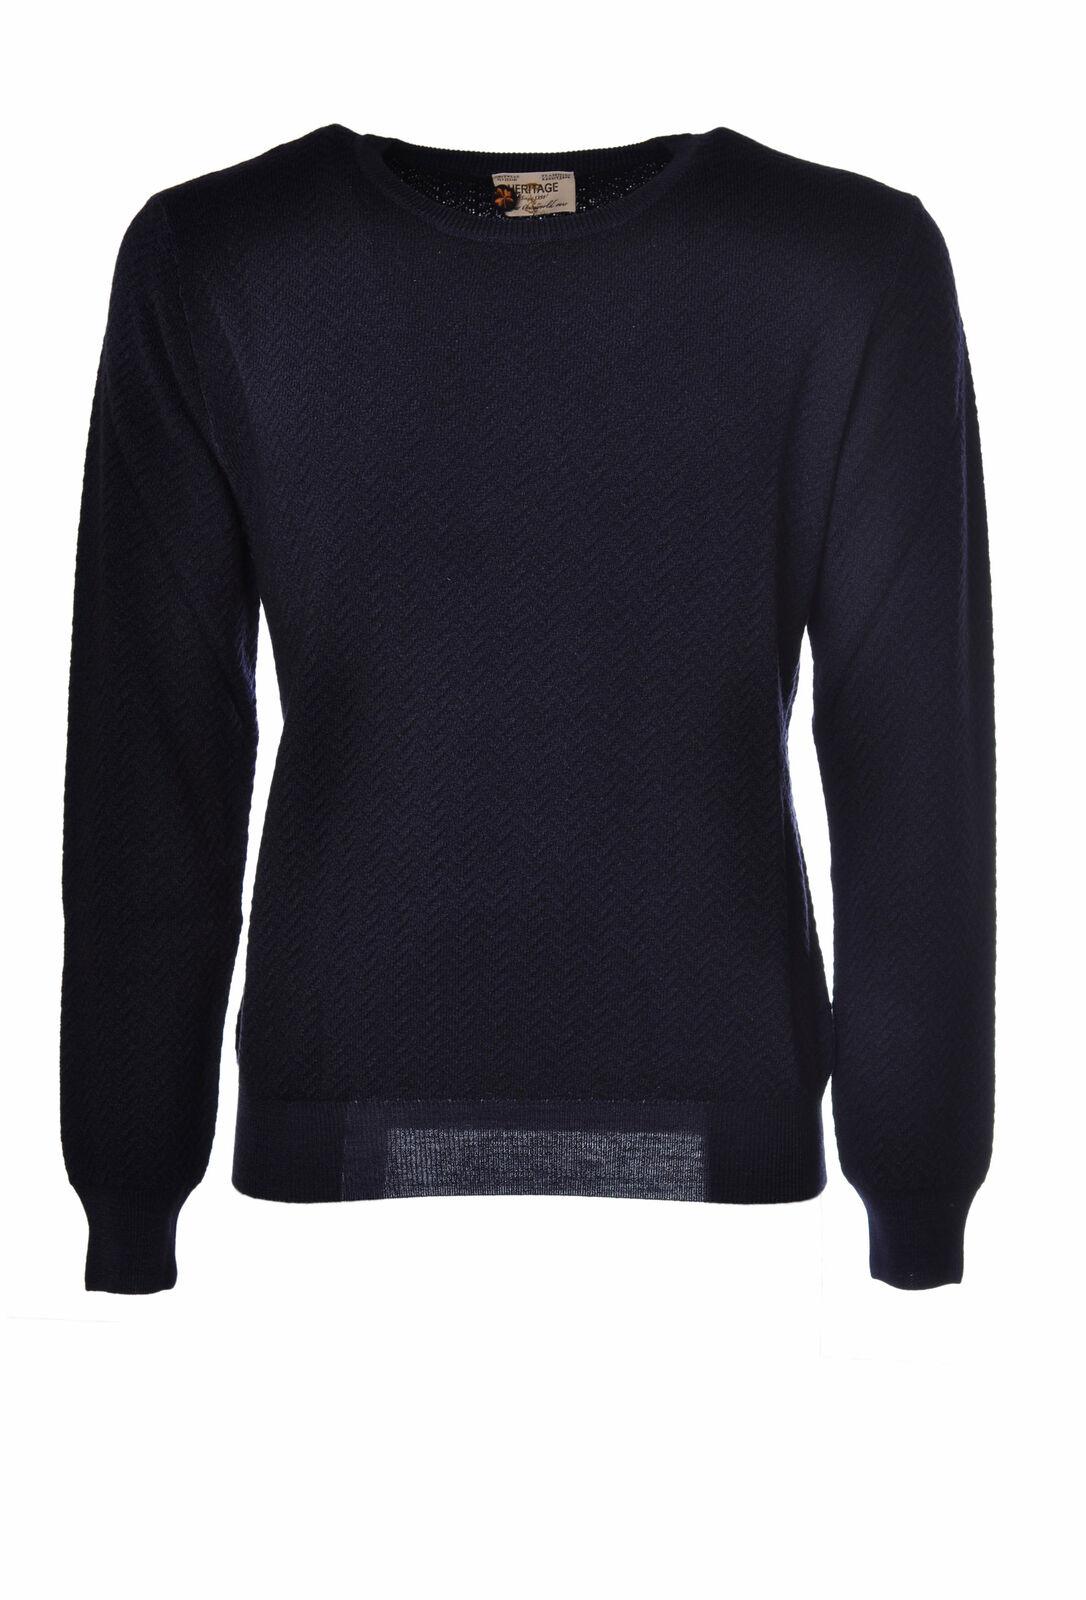 Heritage  -  Sweaters - Male - Blau - 2624314A180104